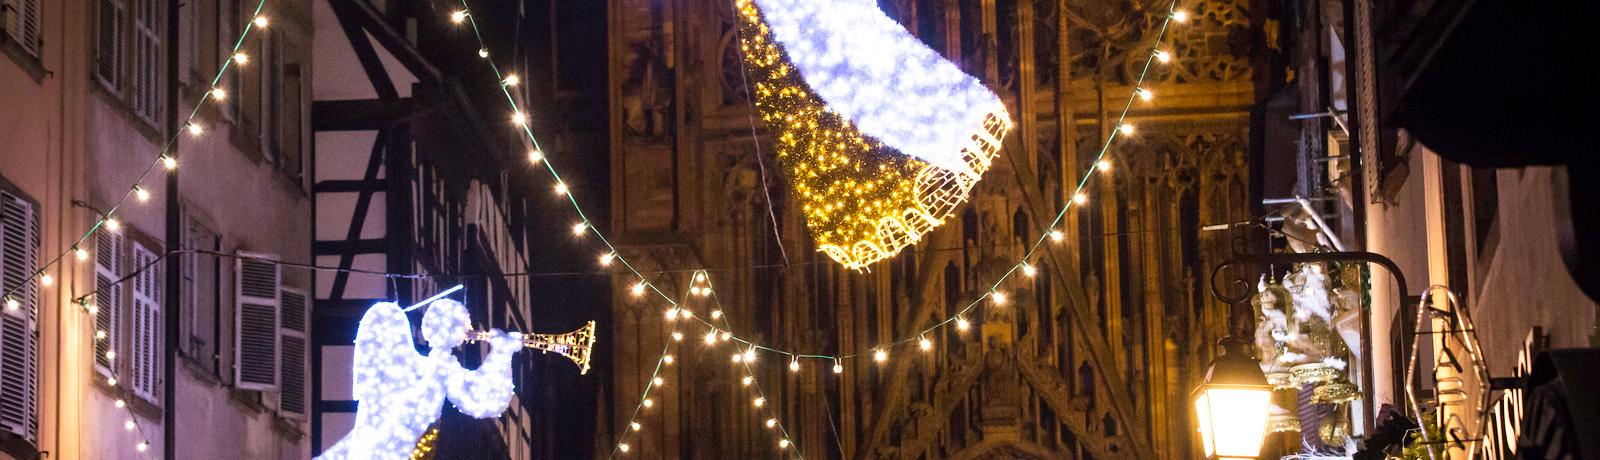 Illuminations de Noël - Rue Mercière Strasbourg